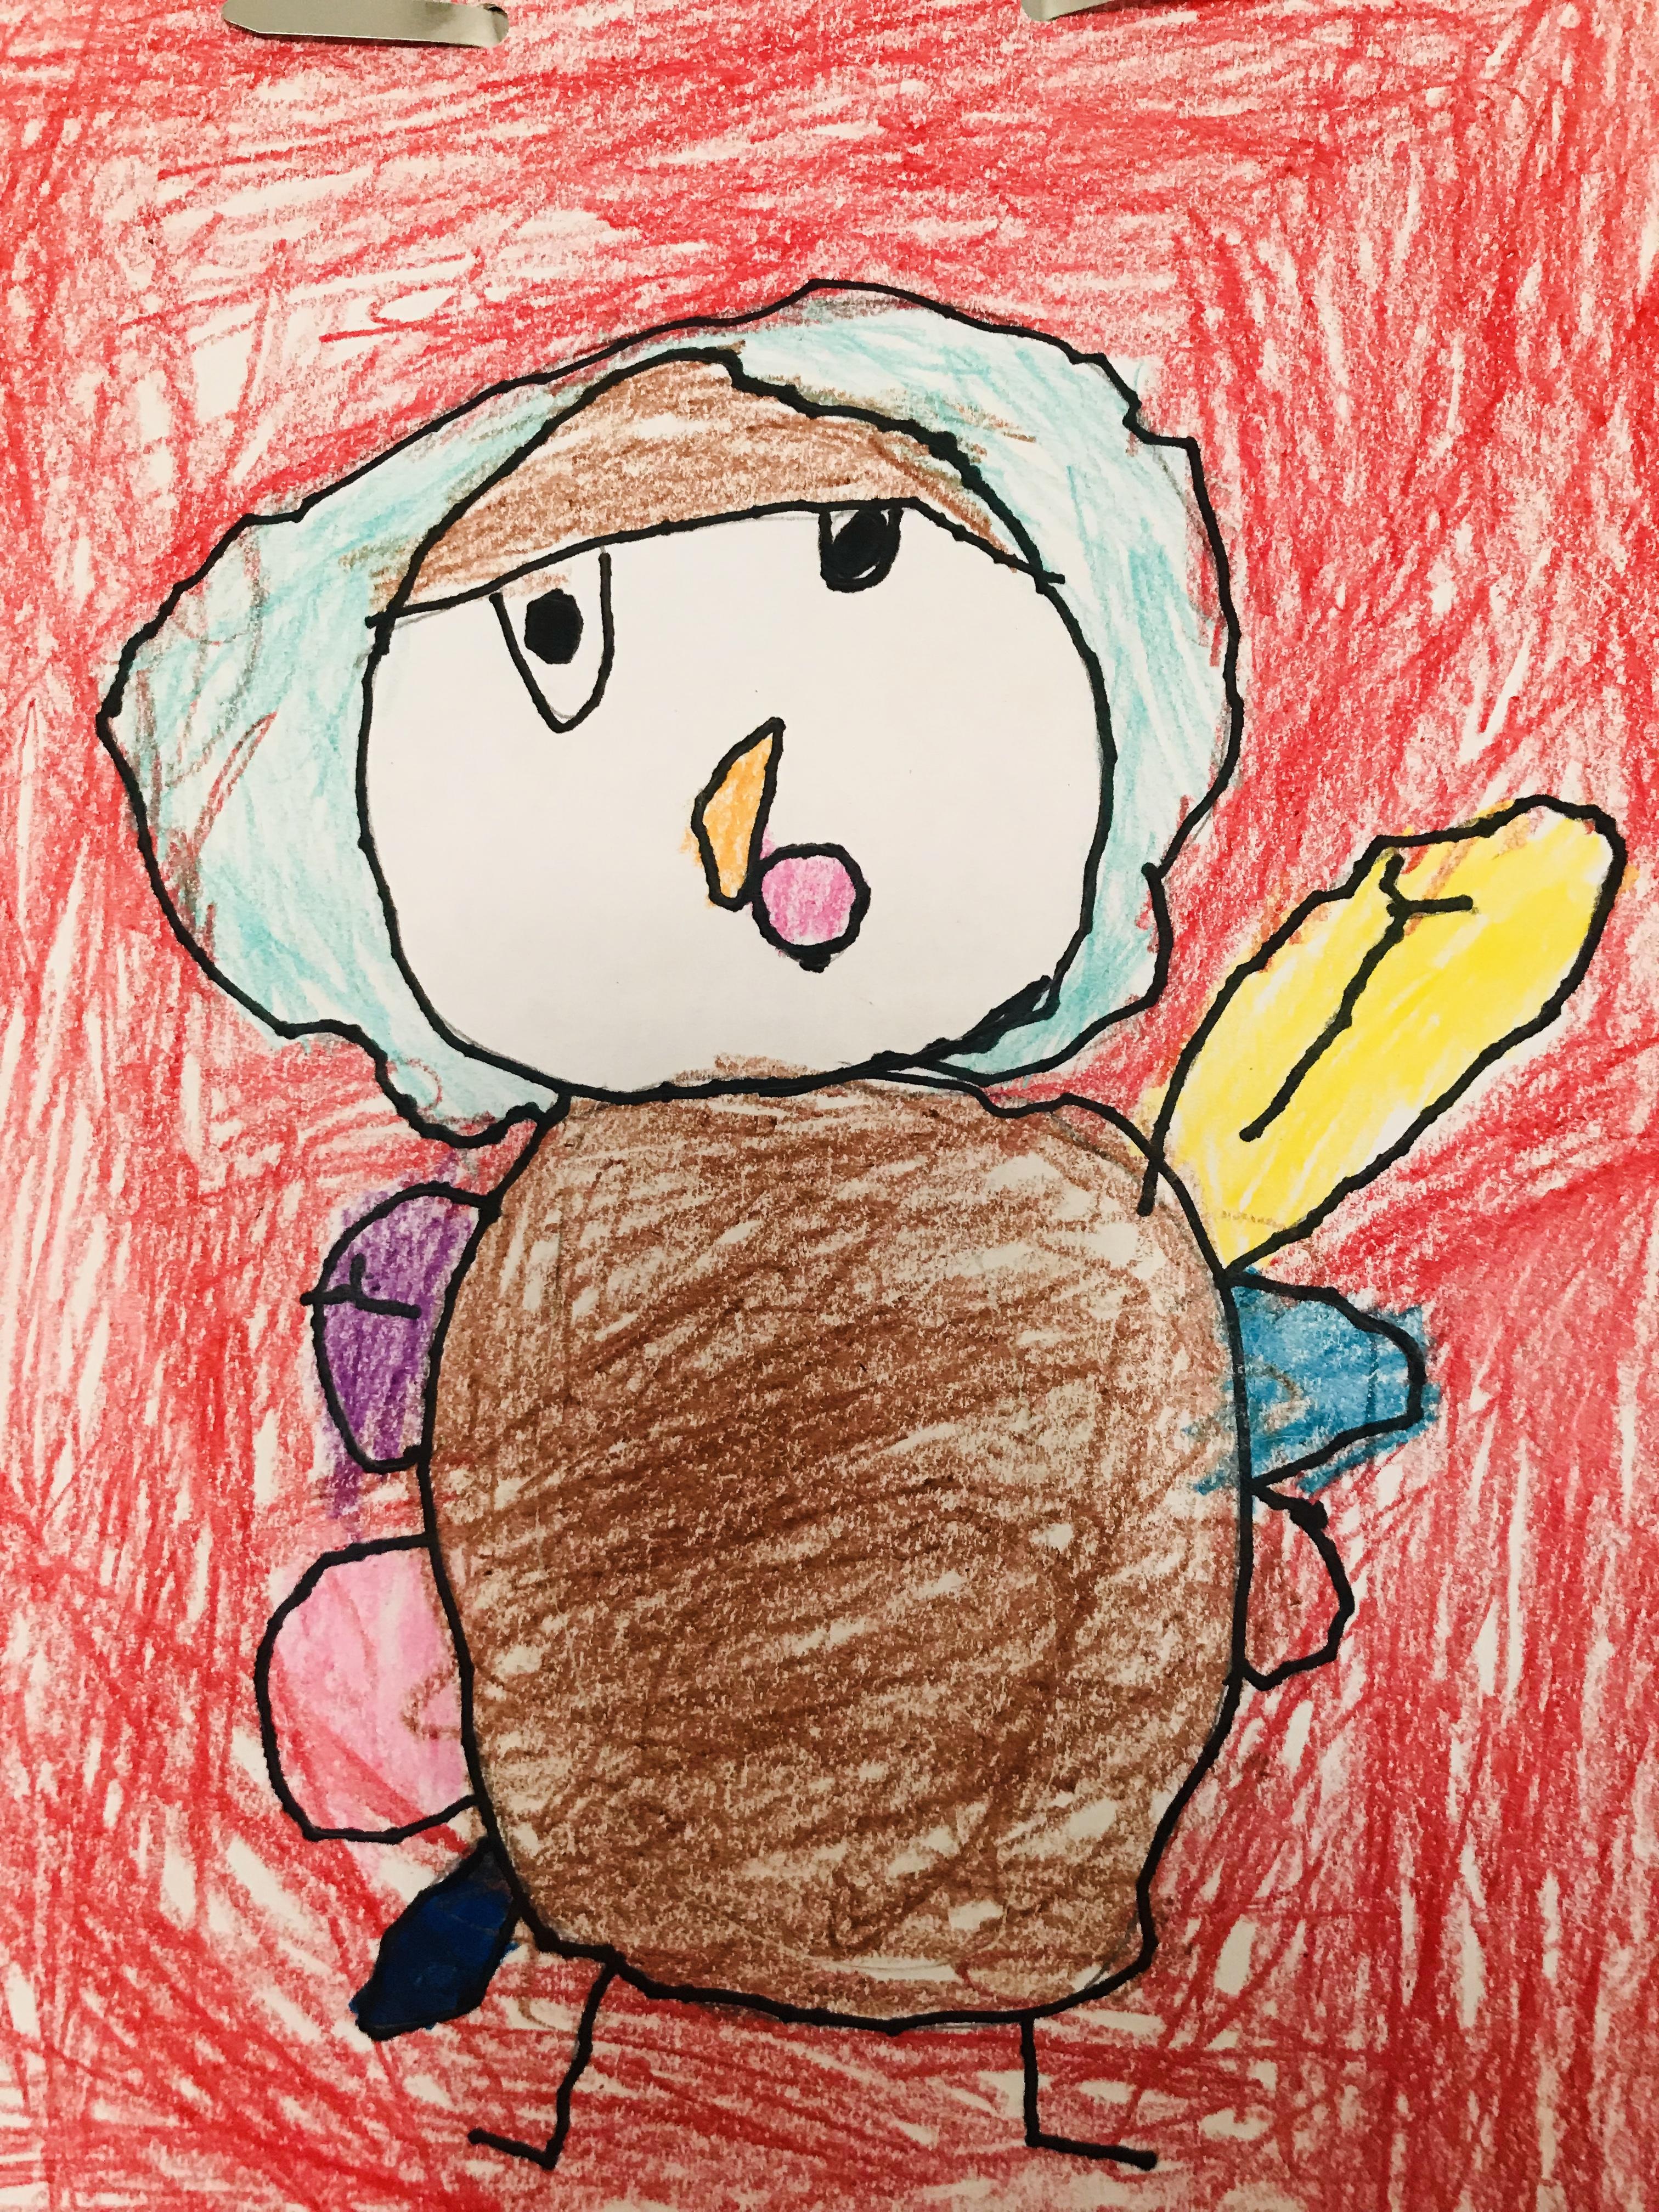 Drawn turkey with red background